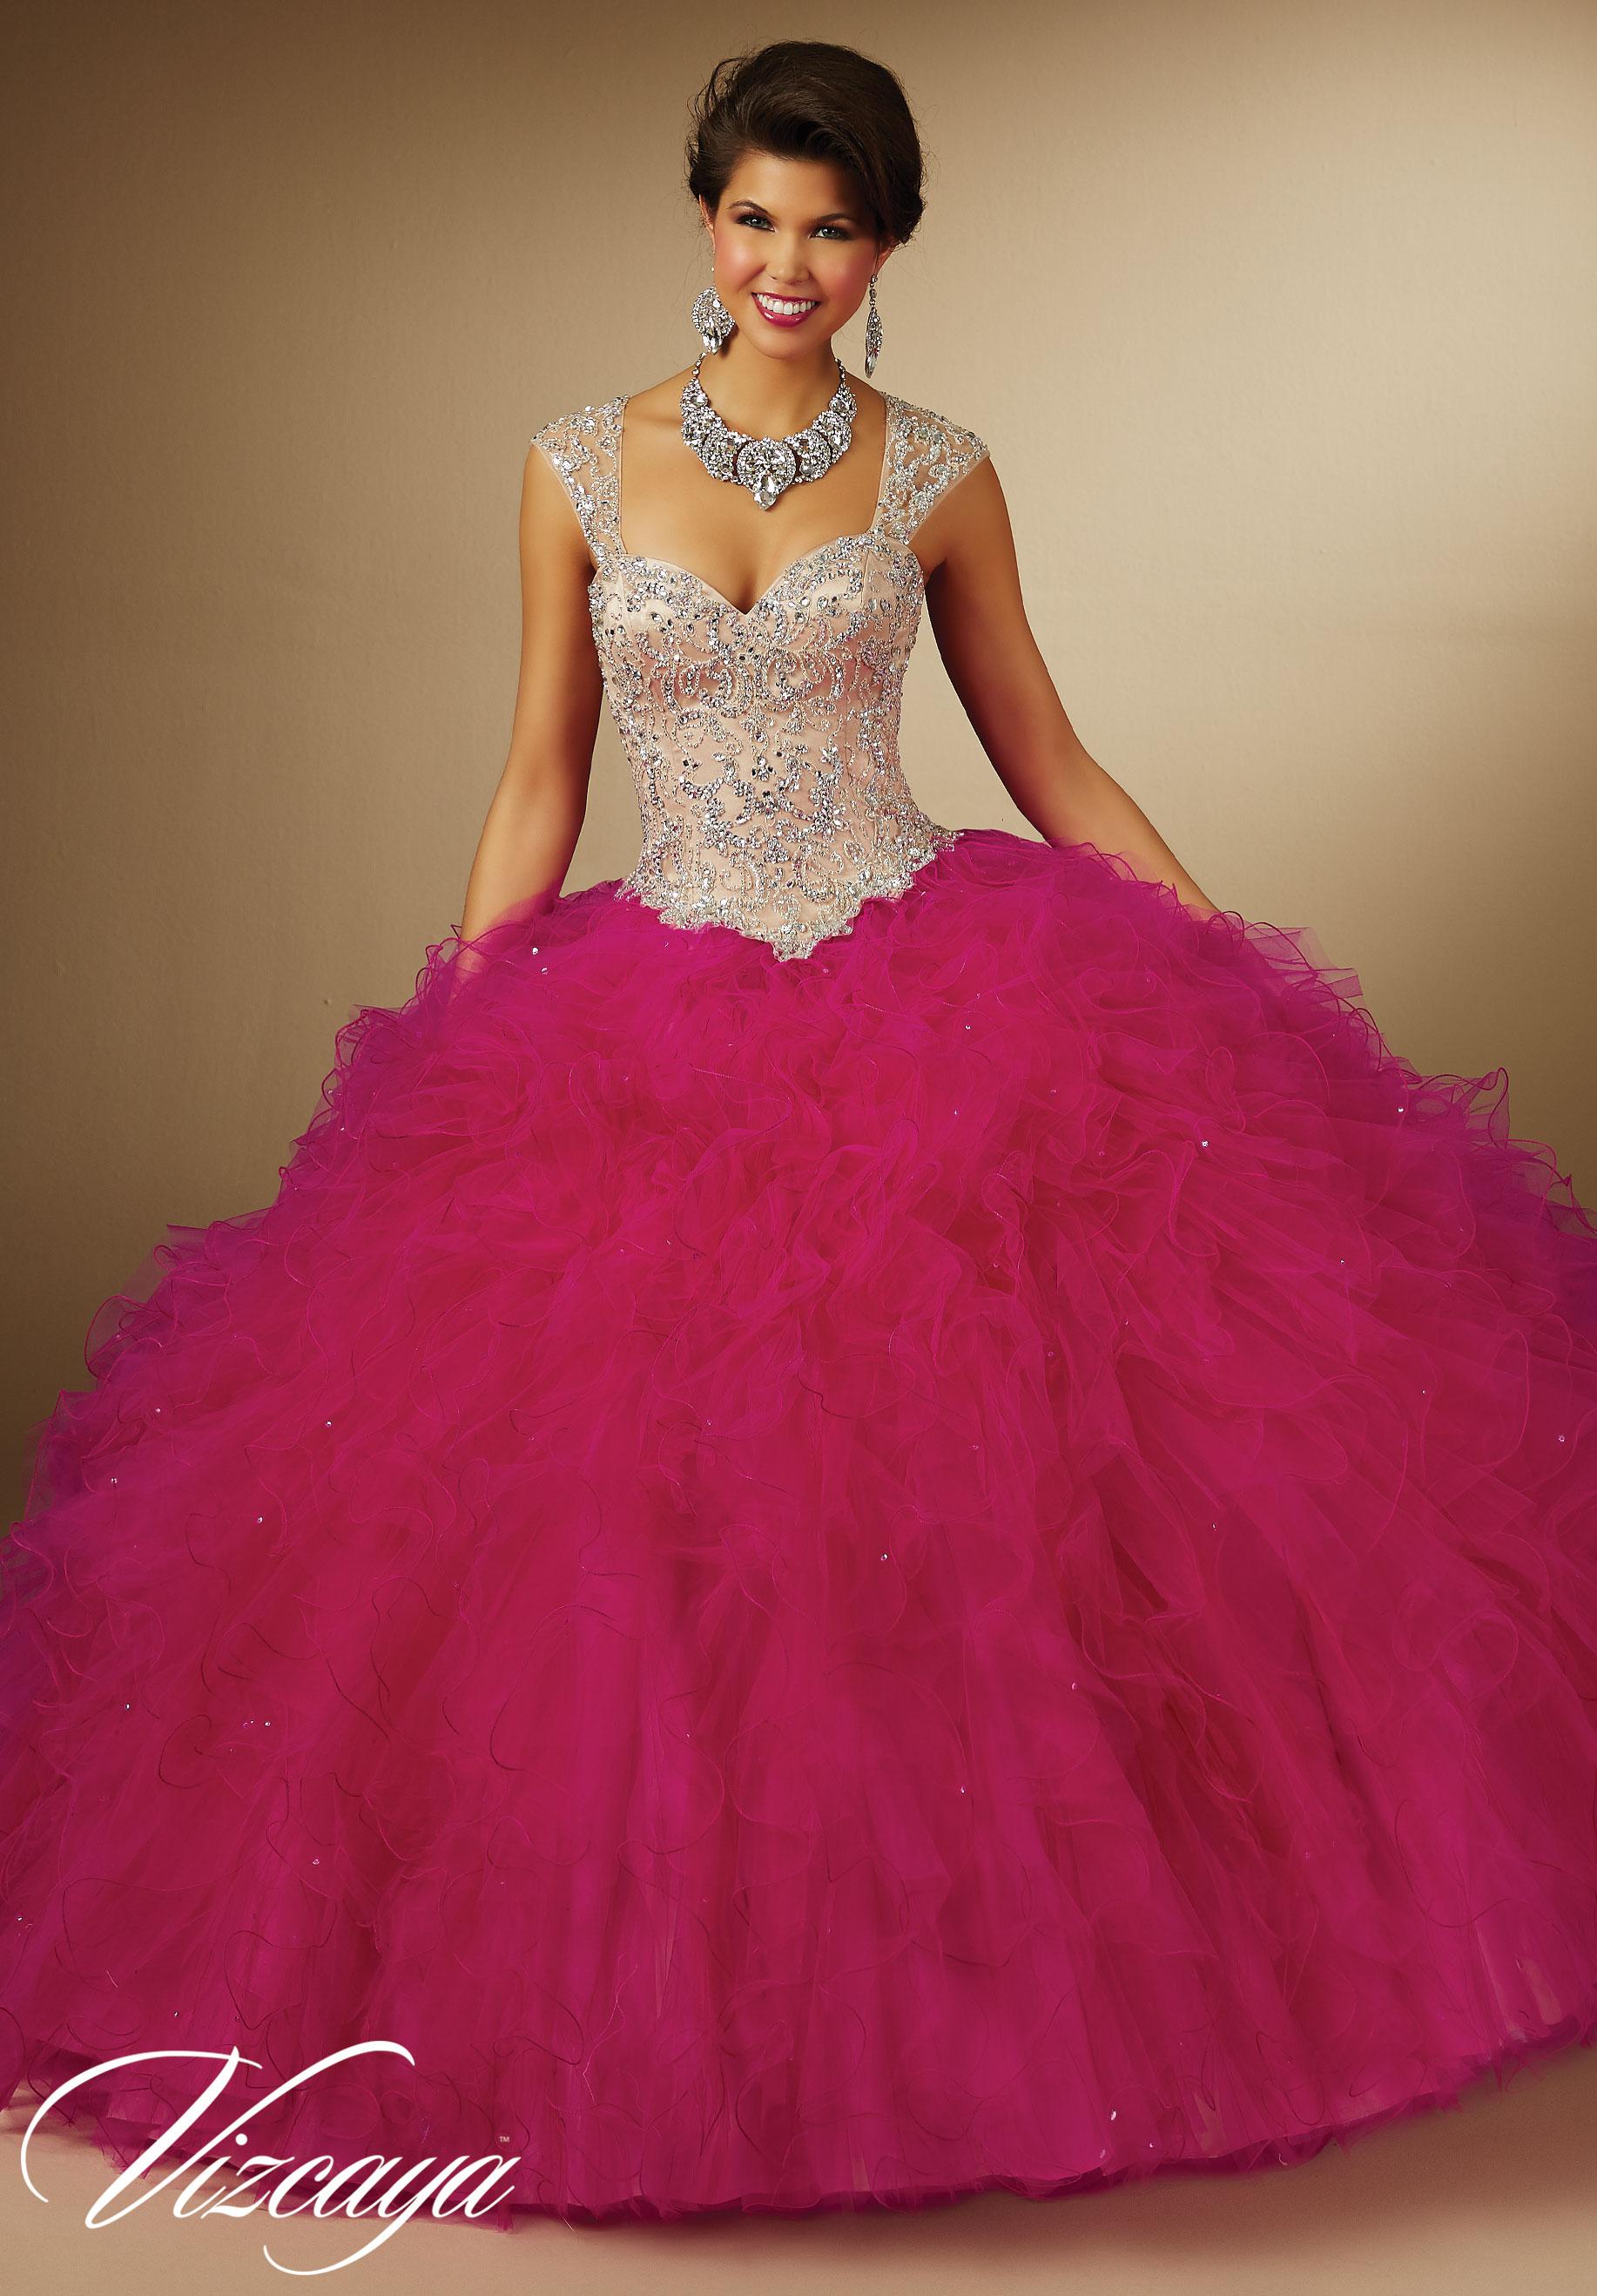 Quinceañera Dresses – Celebrations de todo | Is the place where you ...